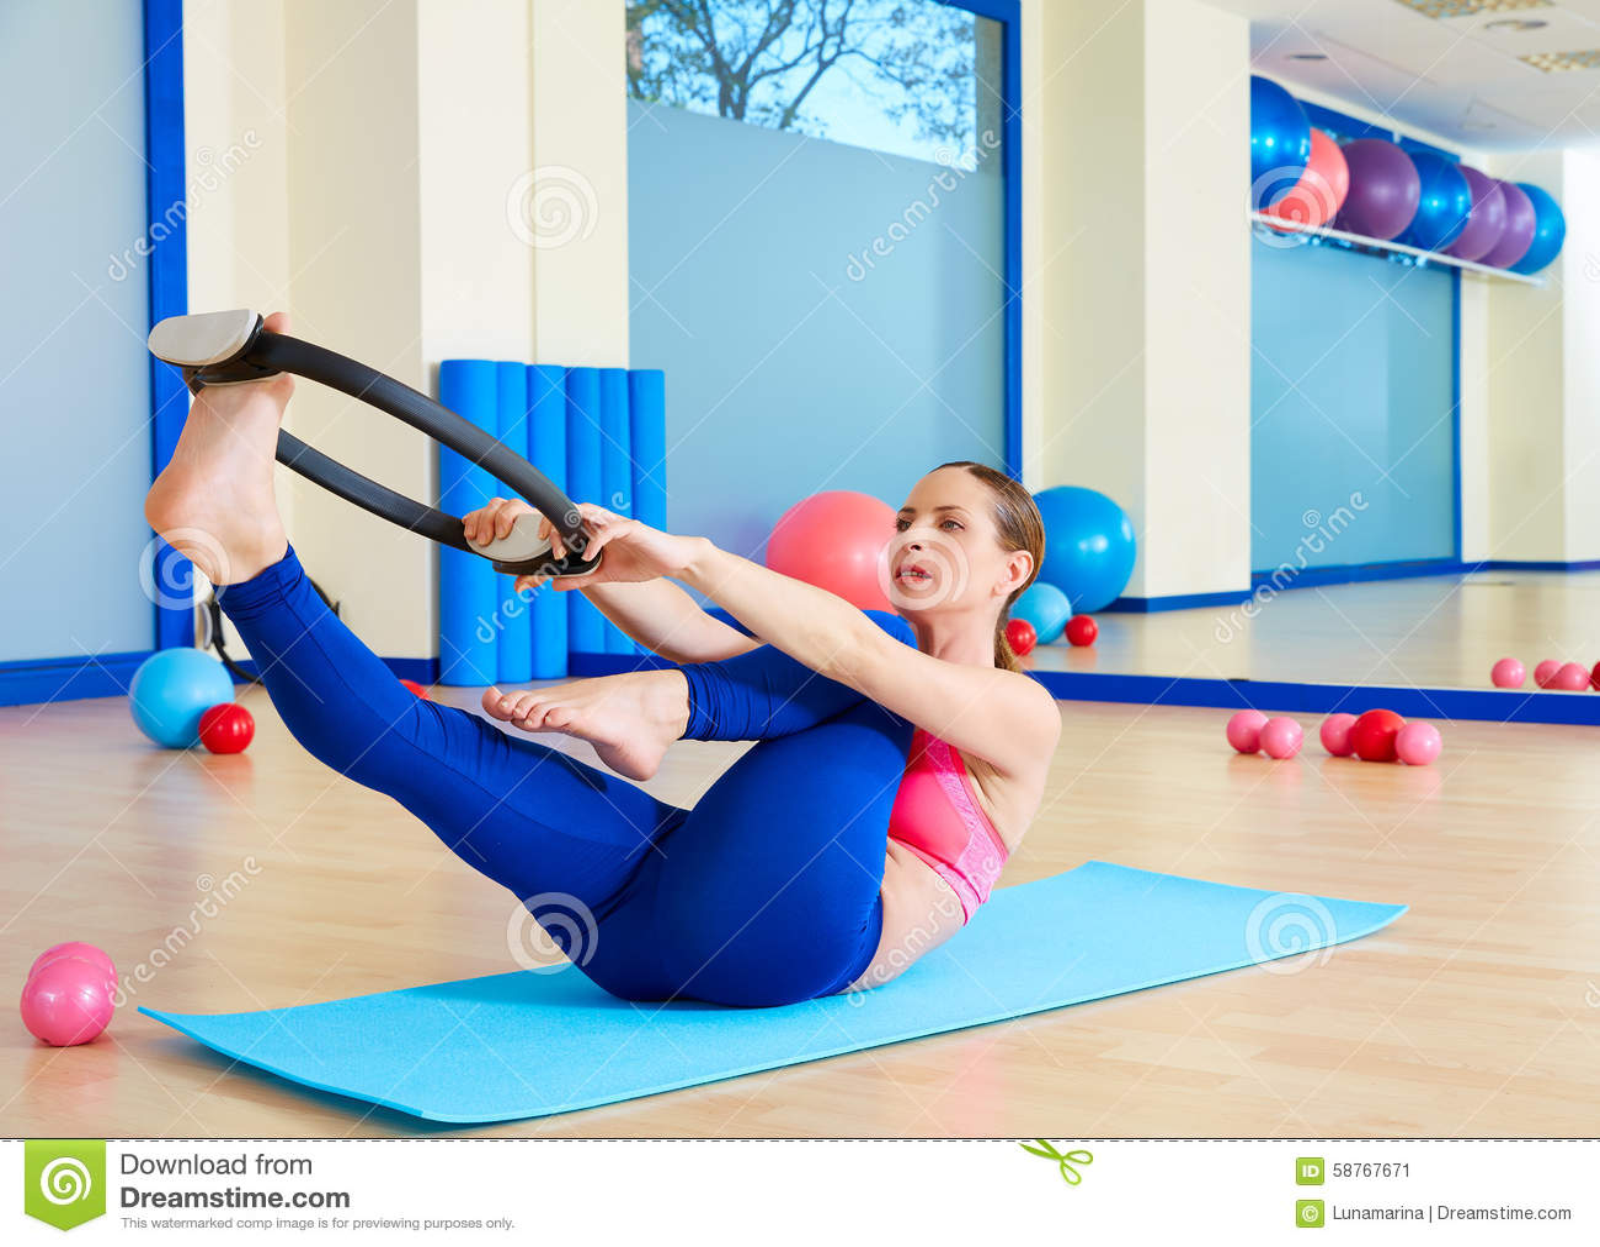 Single leg circles pilates